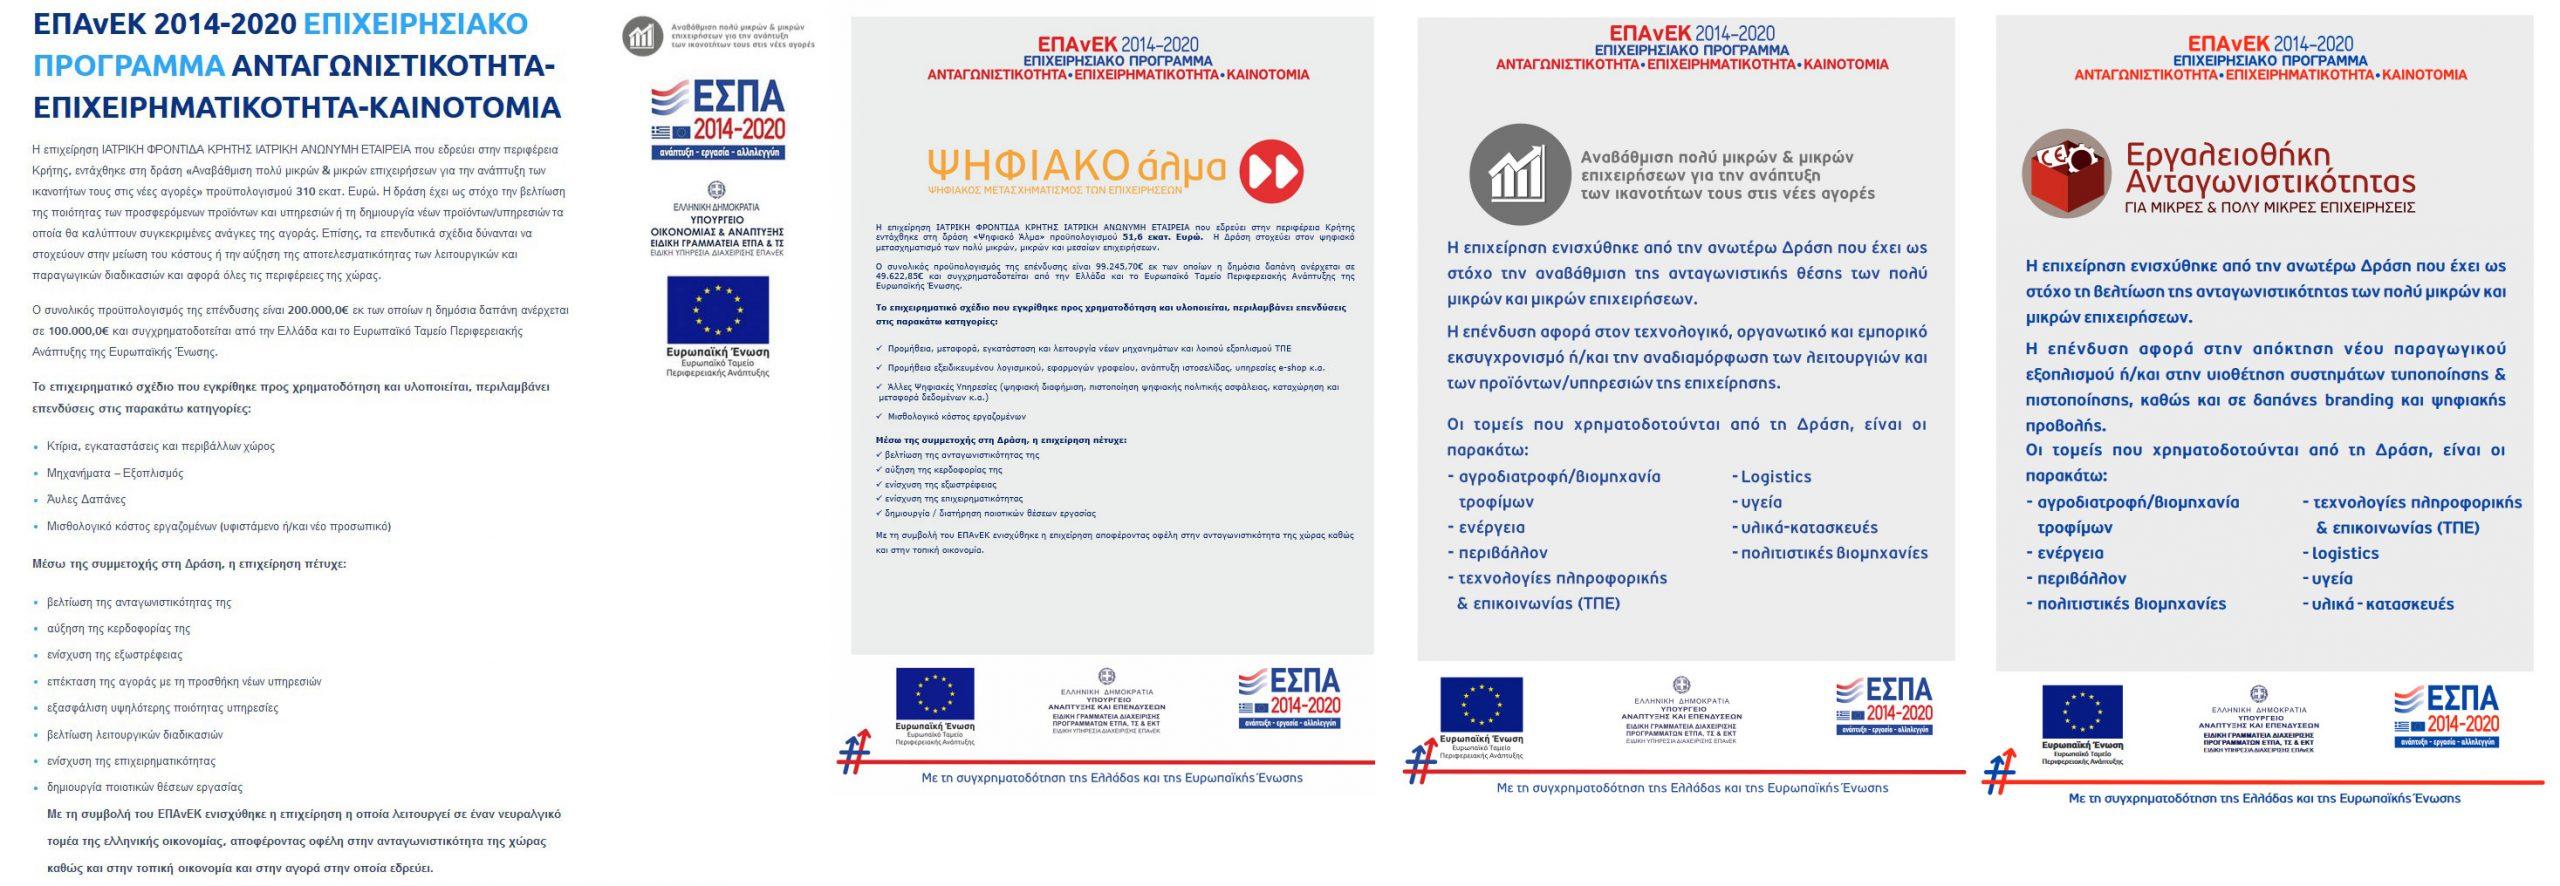 espa_cretanmedicare_GR